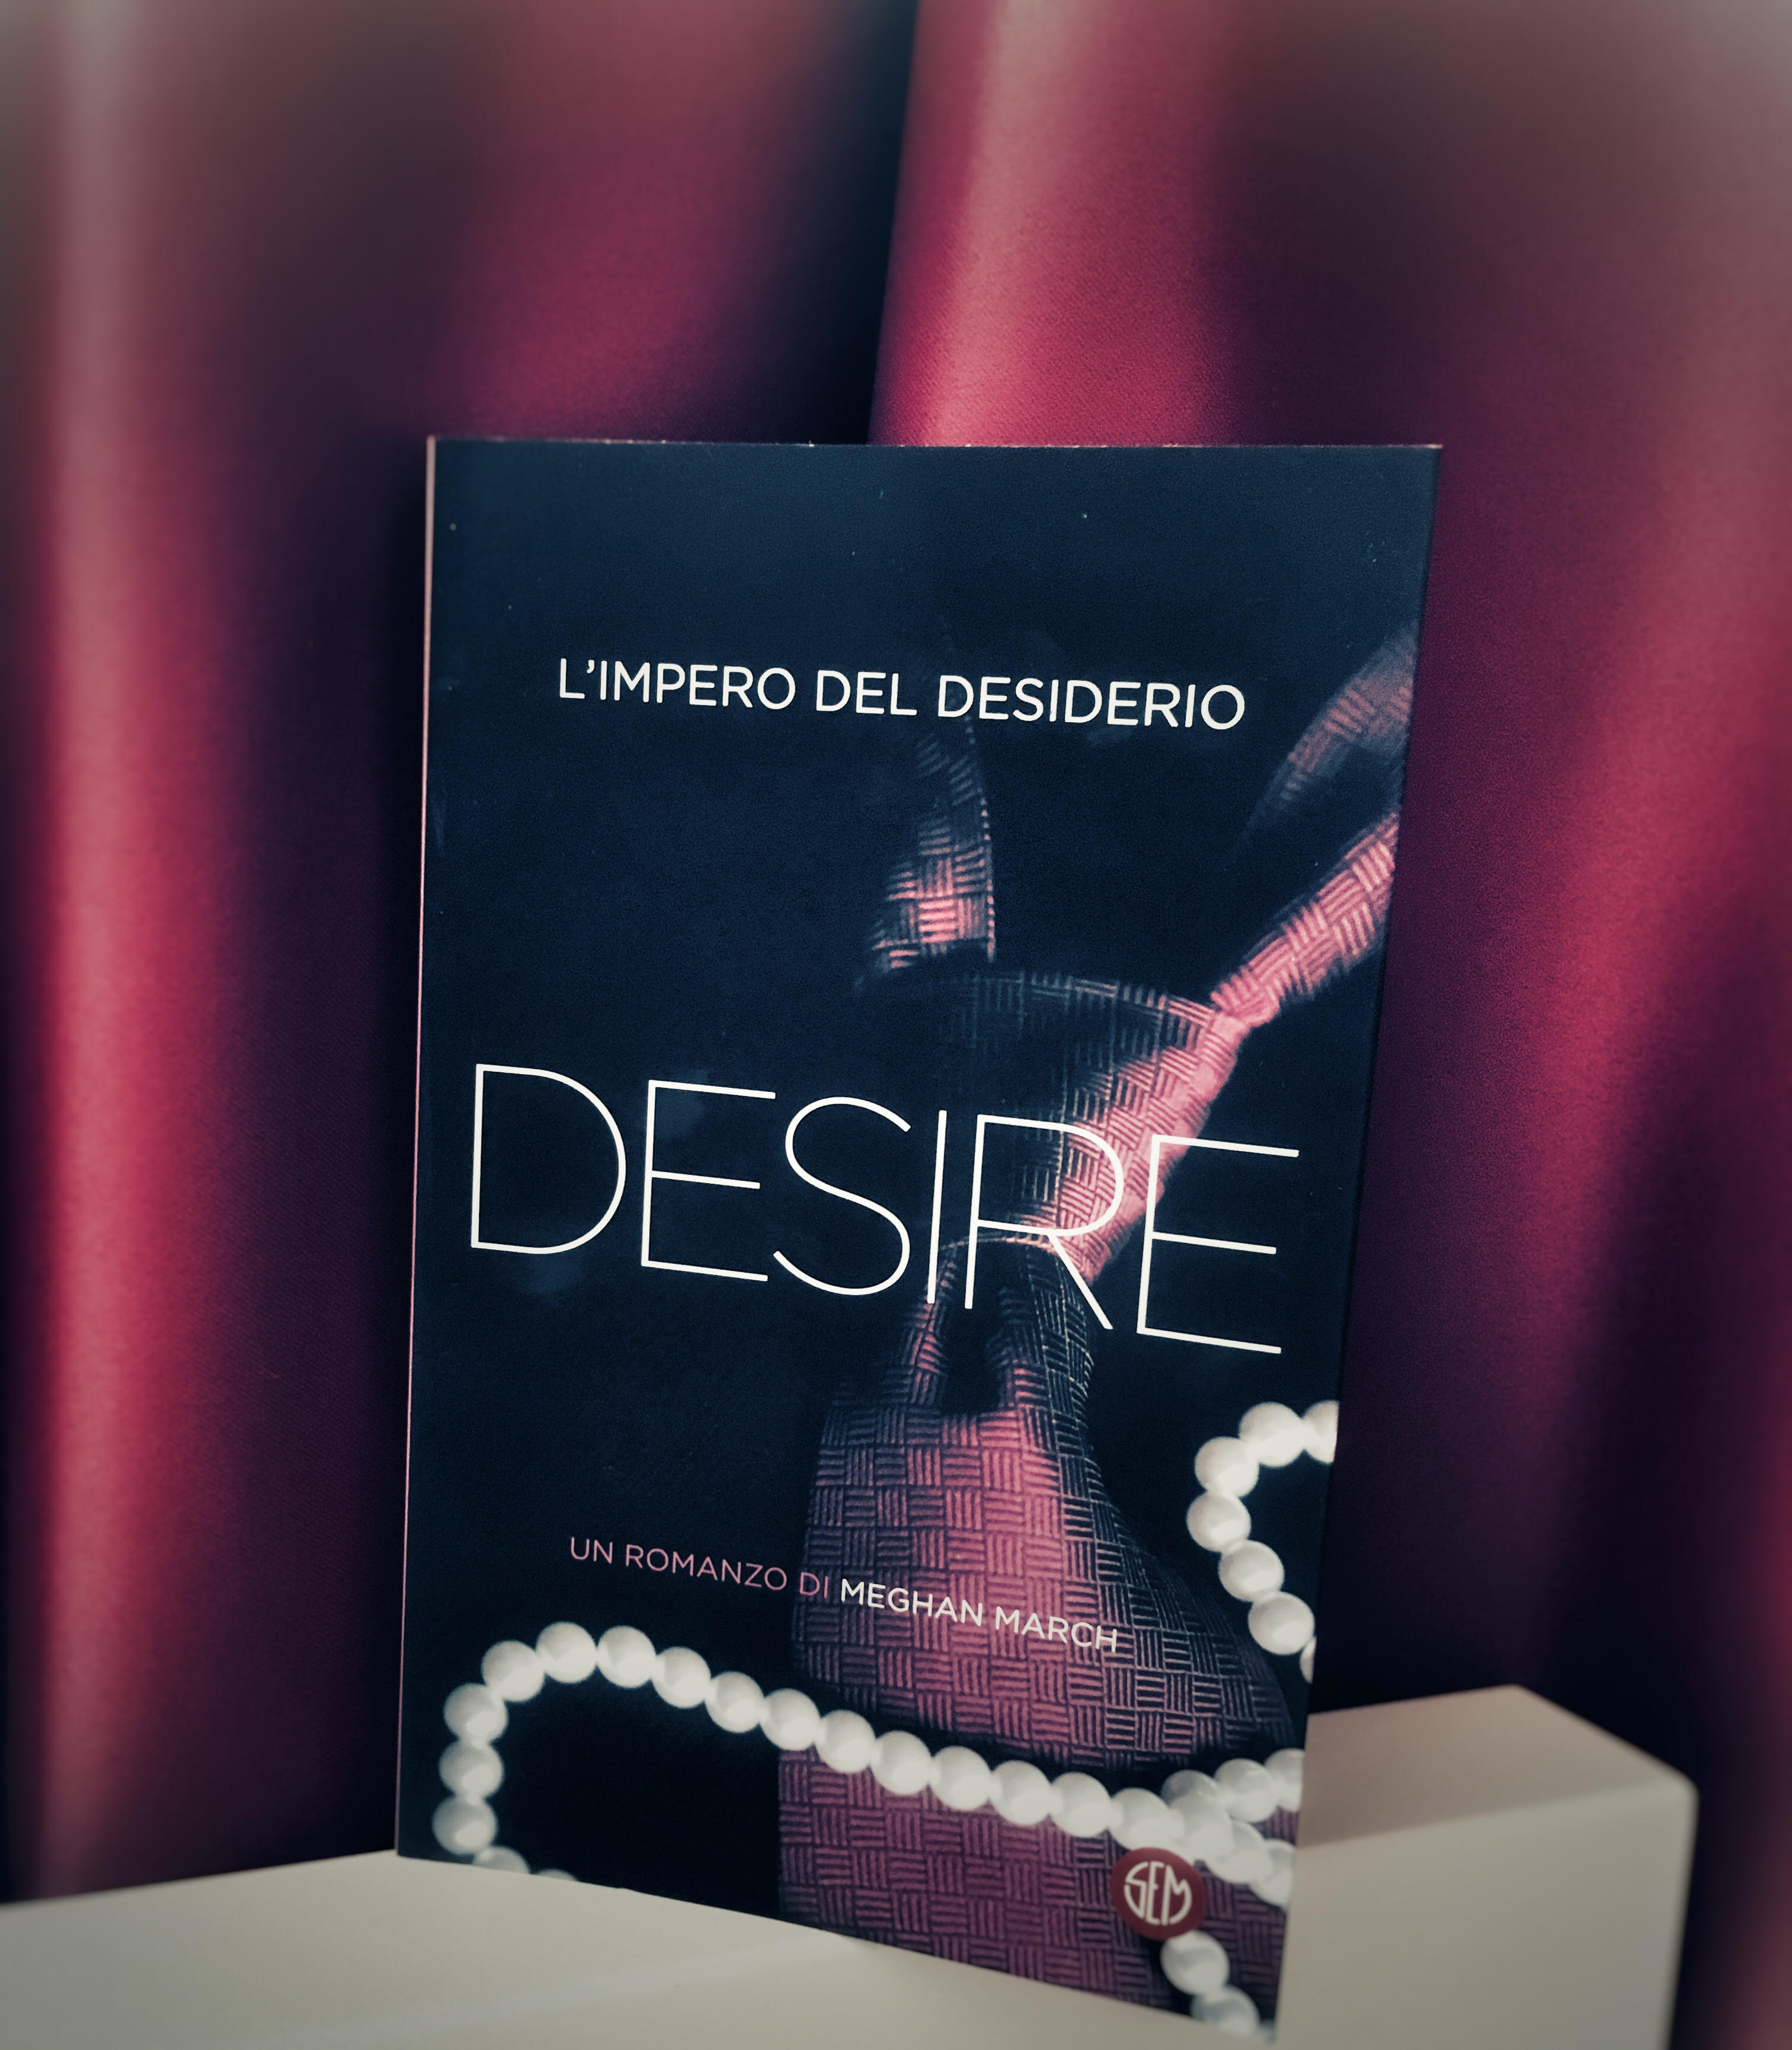 Desire L'impero Del Desiderio – Meghan March, RECENSIONE